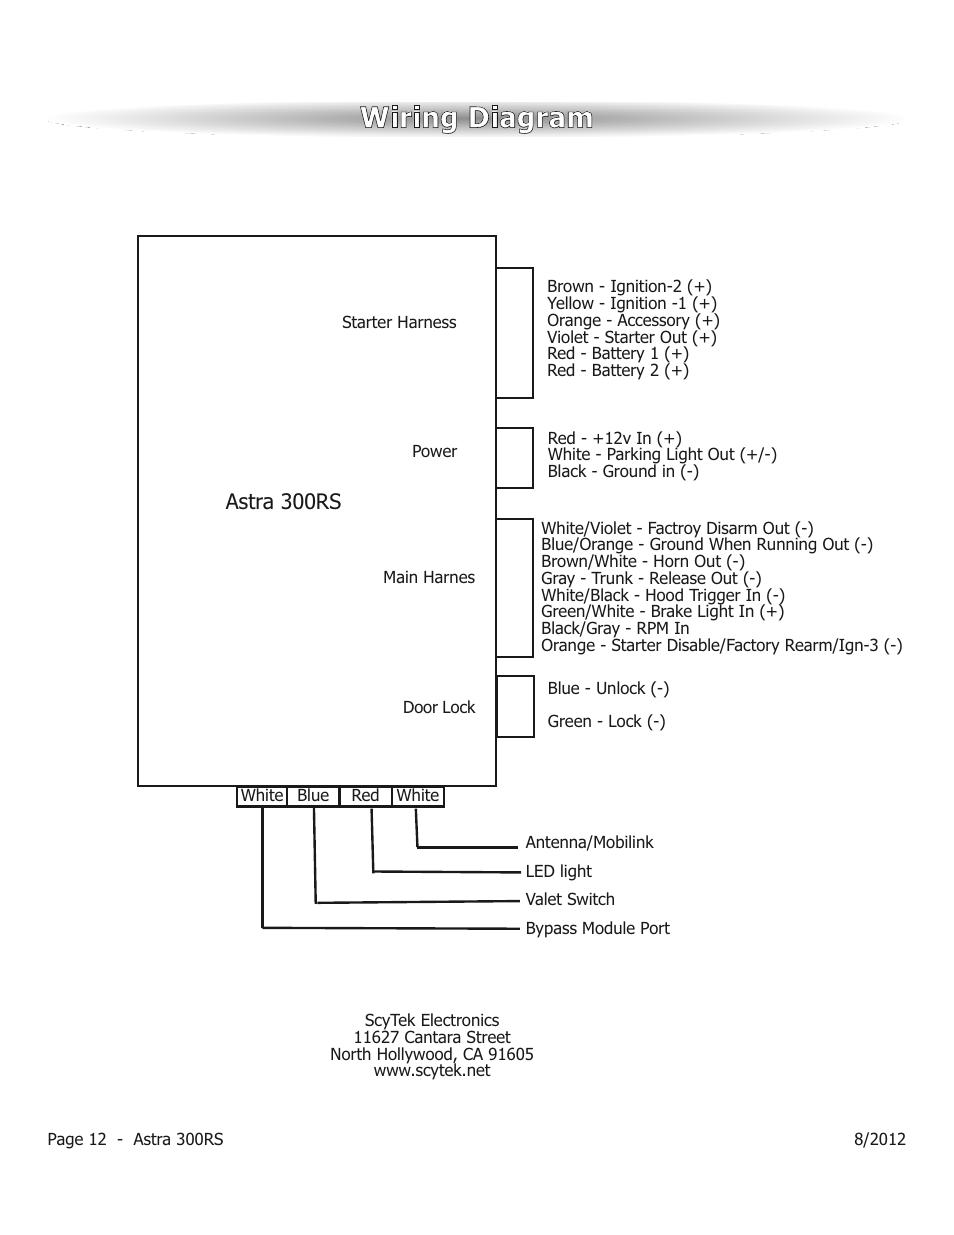 John Deere Starter Wiring Diagram Wiring Diagram Astra 300rs Scytek Electronics Astra